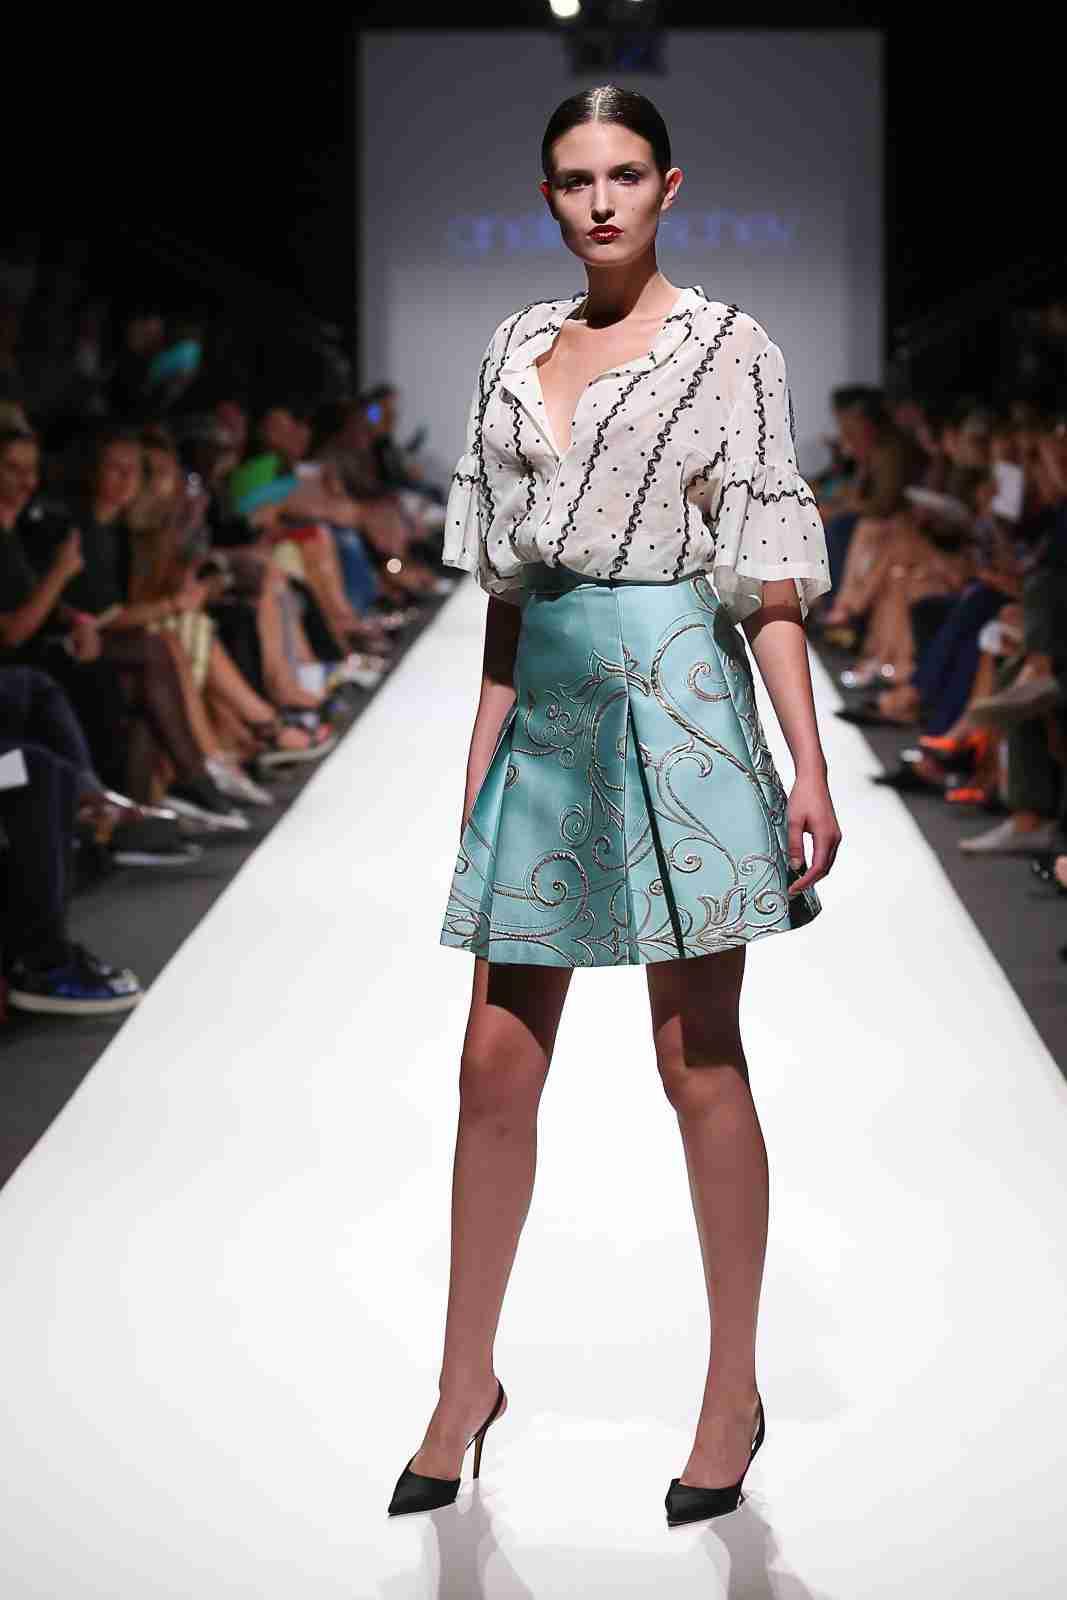 Designer: Anelia Pechev, Photographer: Valeri Angelov, Fotostudio VogueSpot